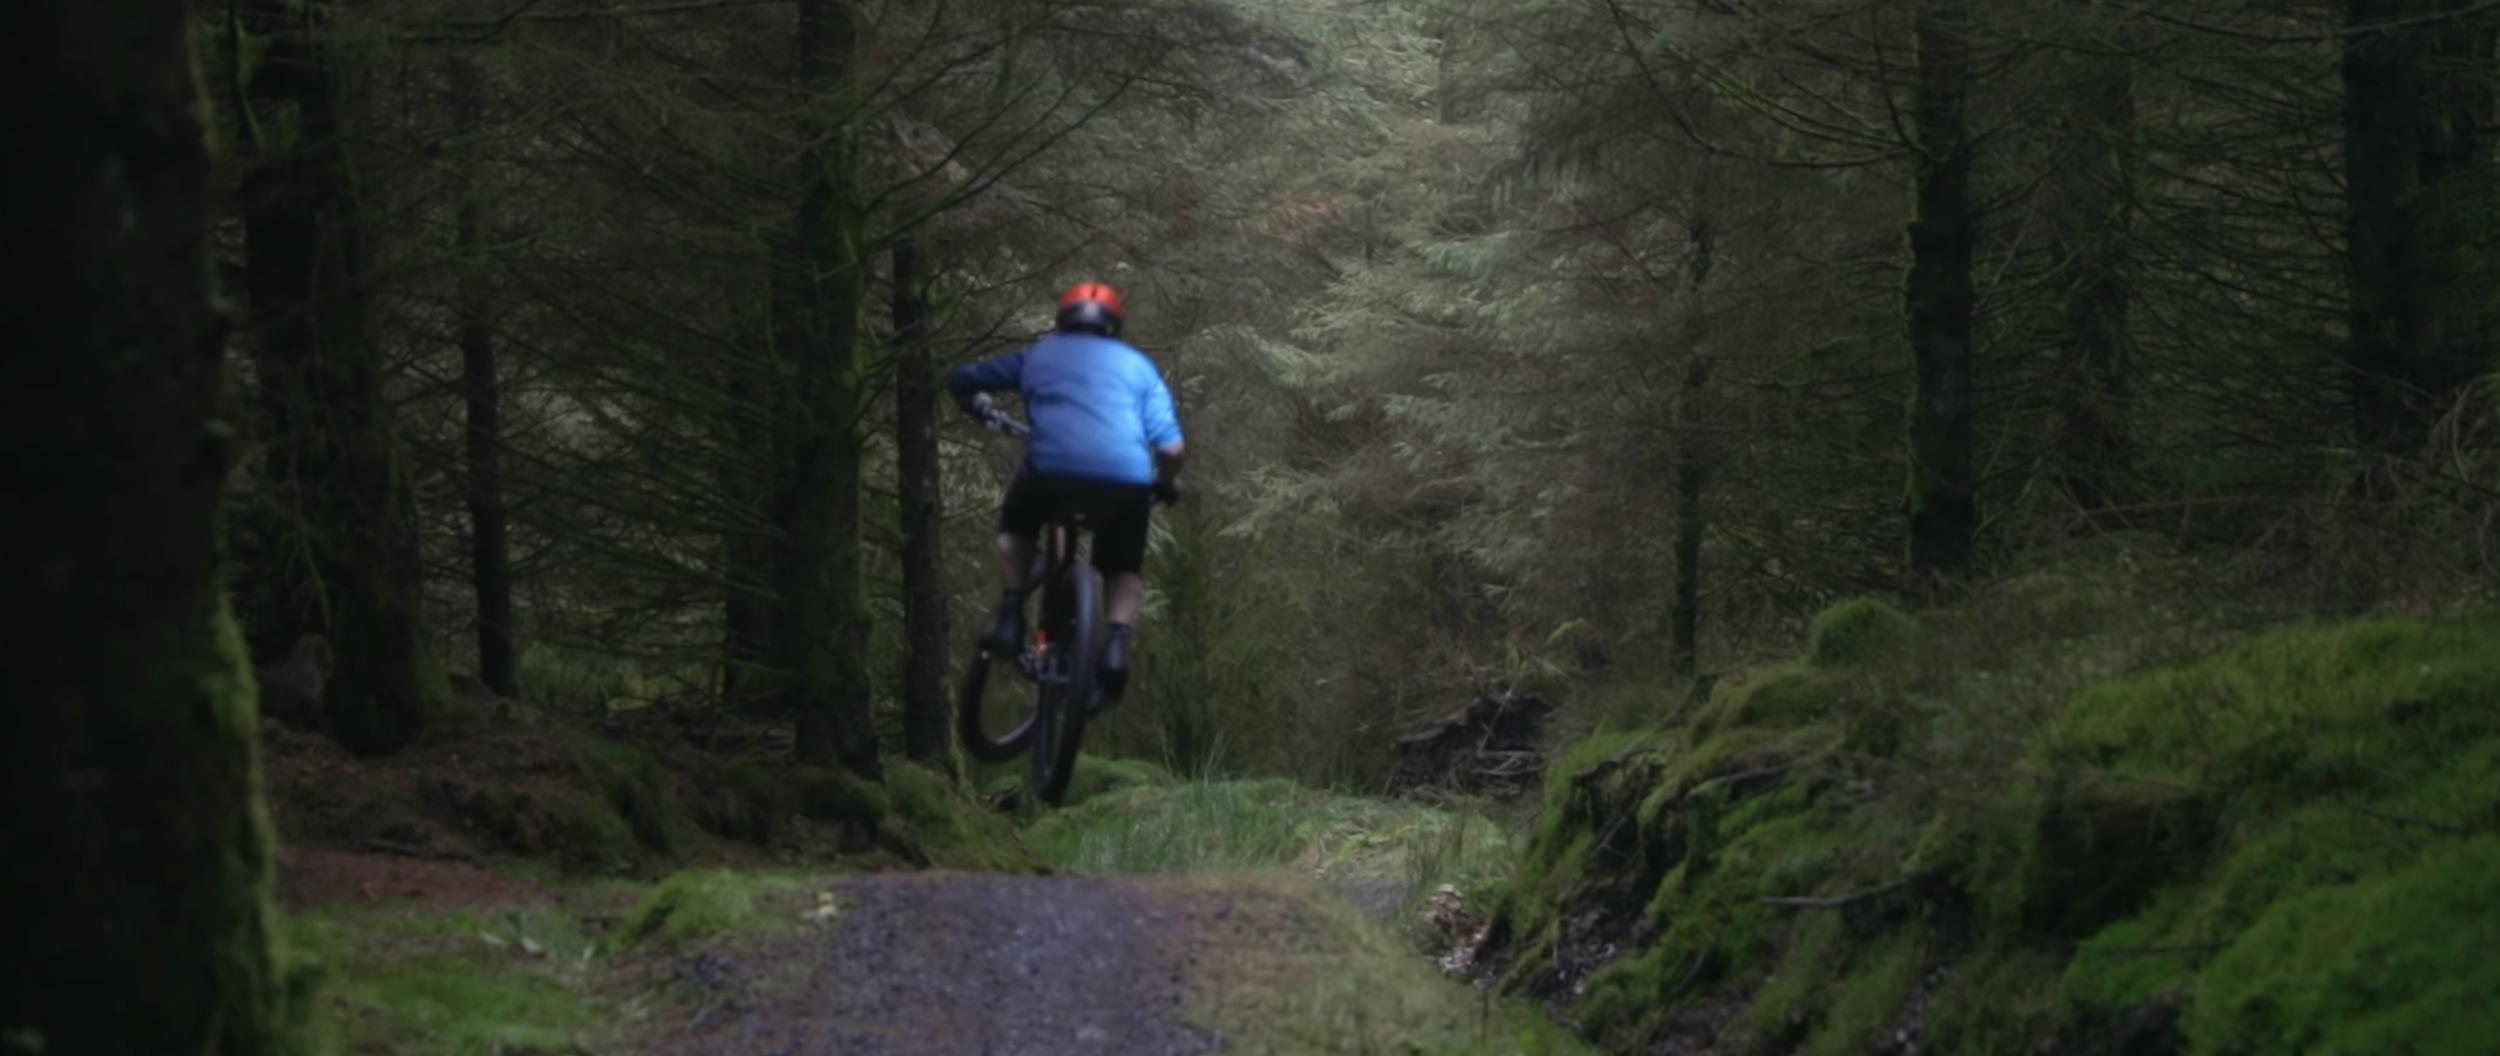 Kielder Trails - Northumberland County Council